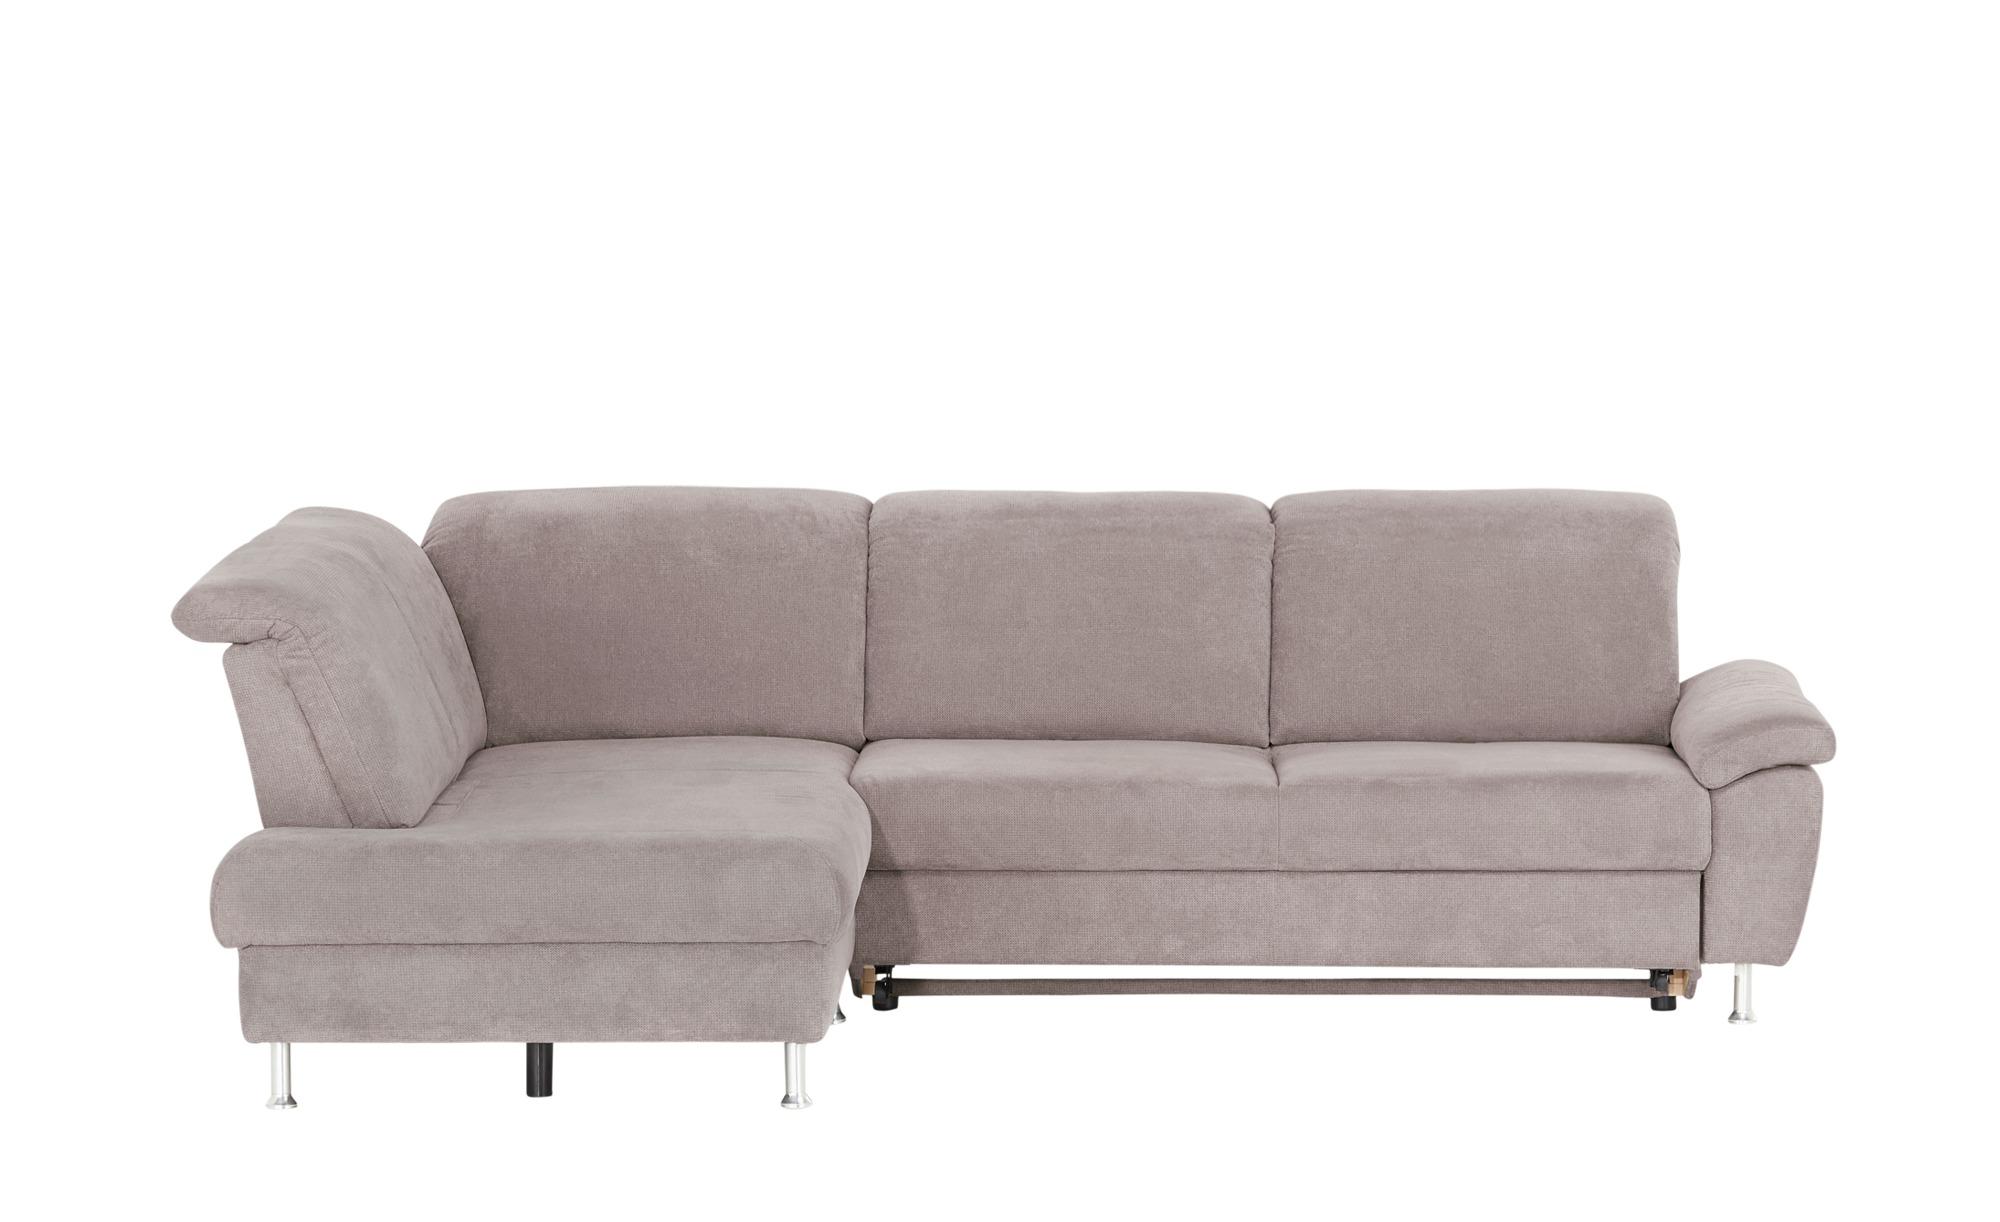 Diva Ecksofa  Diva Lounge ¦ rosa/pink Polstermöbel > Sofas > Ecksofas - Höffner